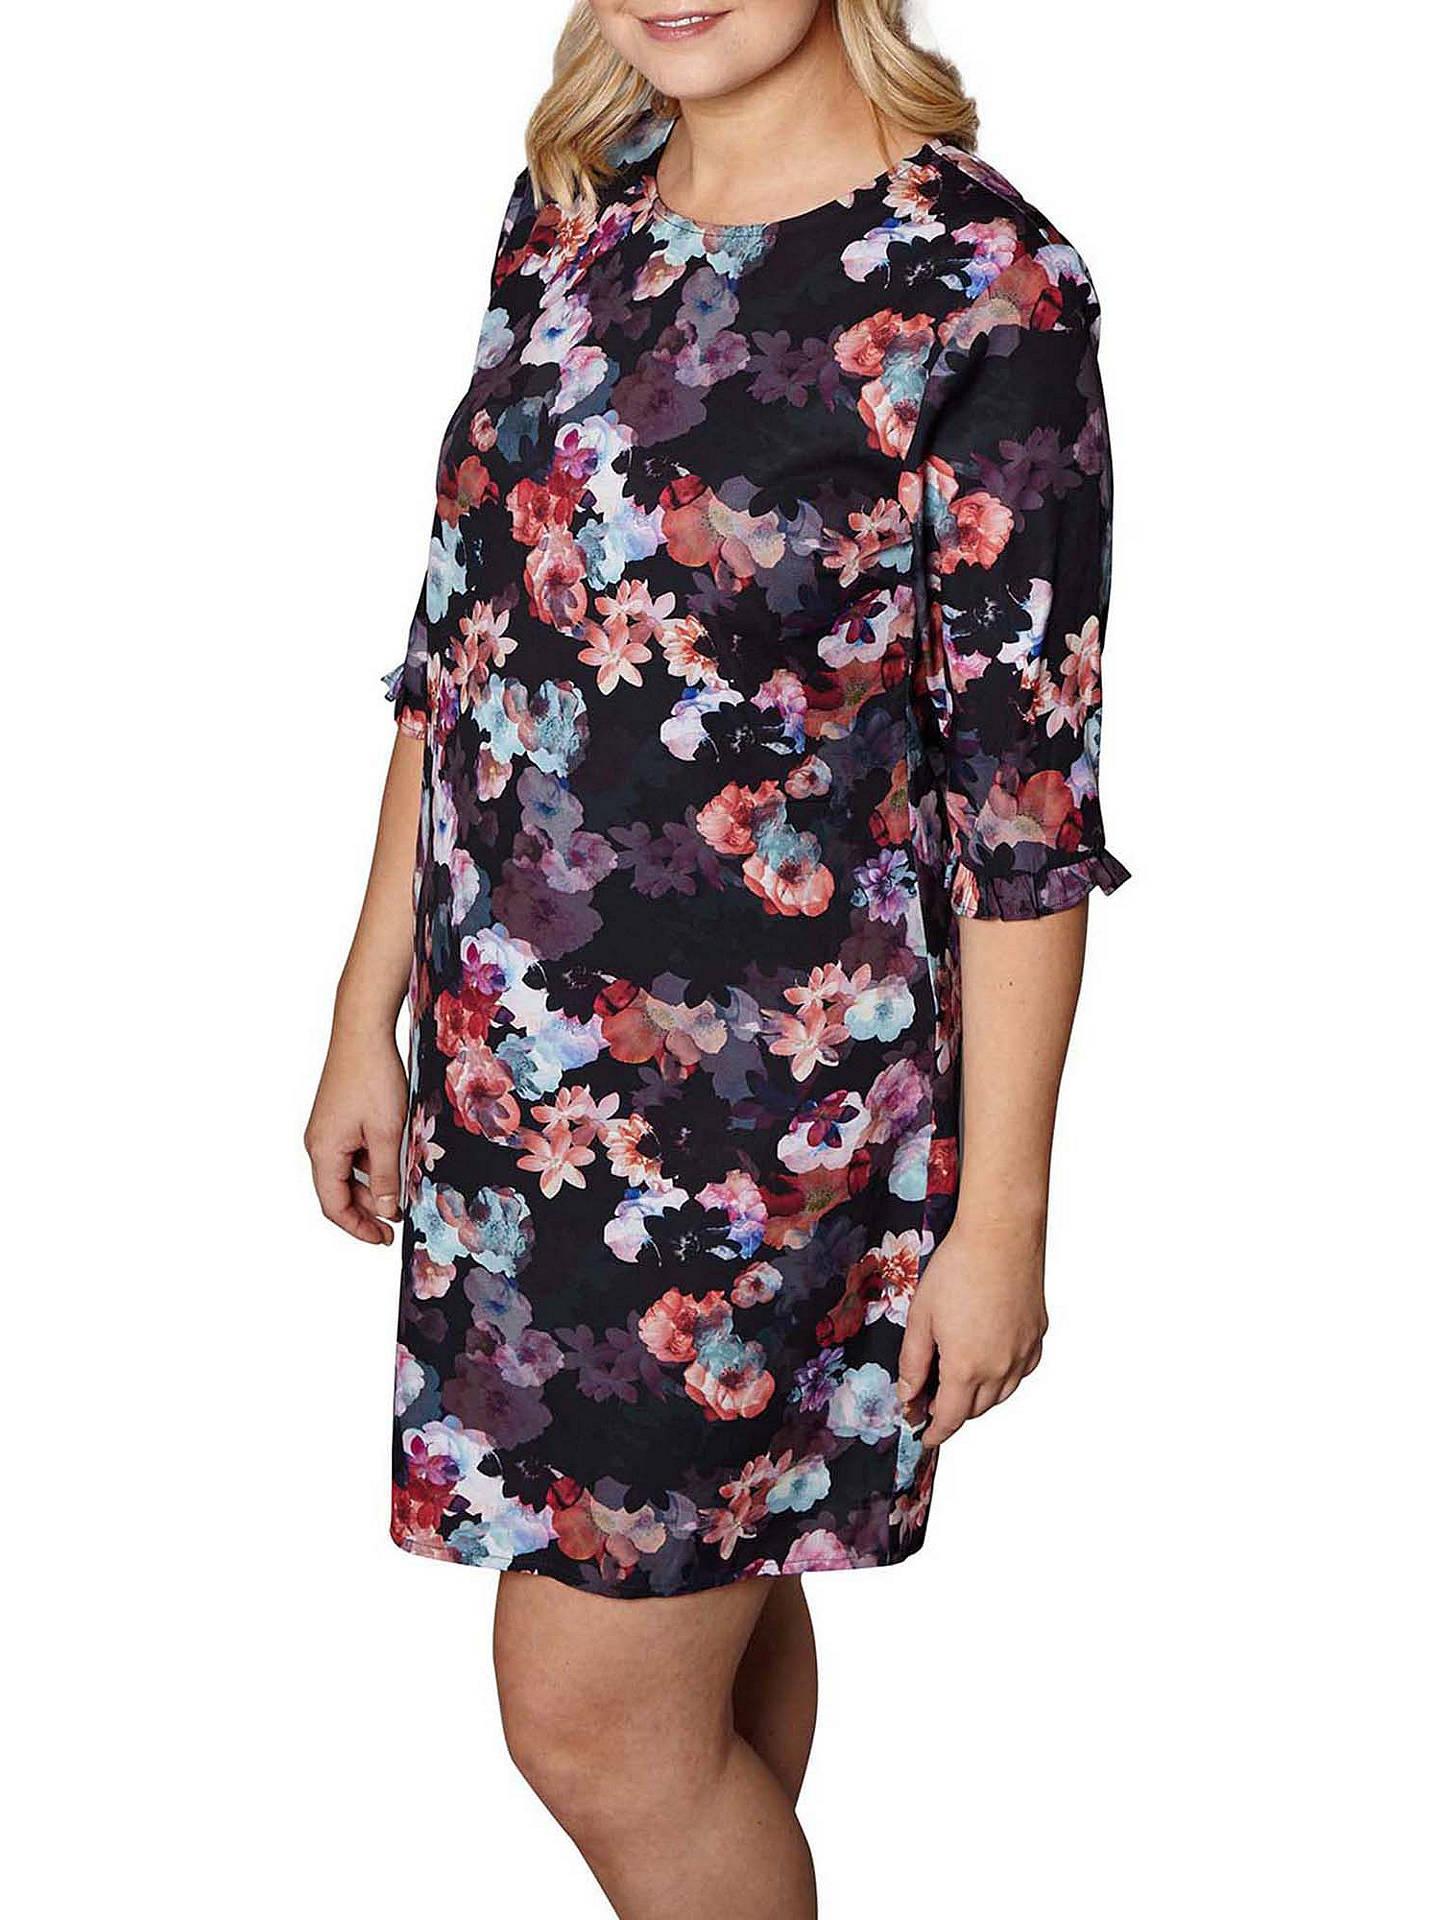 91cabec36dd Buy Yumi Curves Nouvea Floral Tunic Dress, Black, 18 Online at  johnlewis.com ...